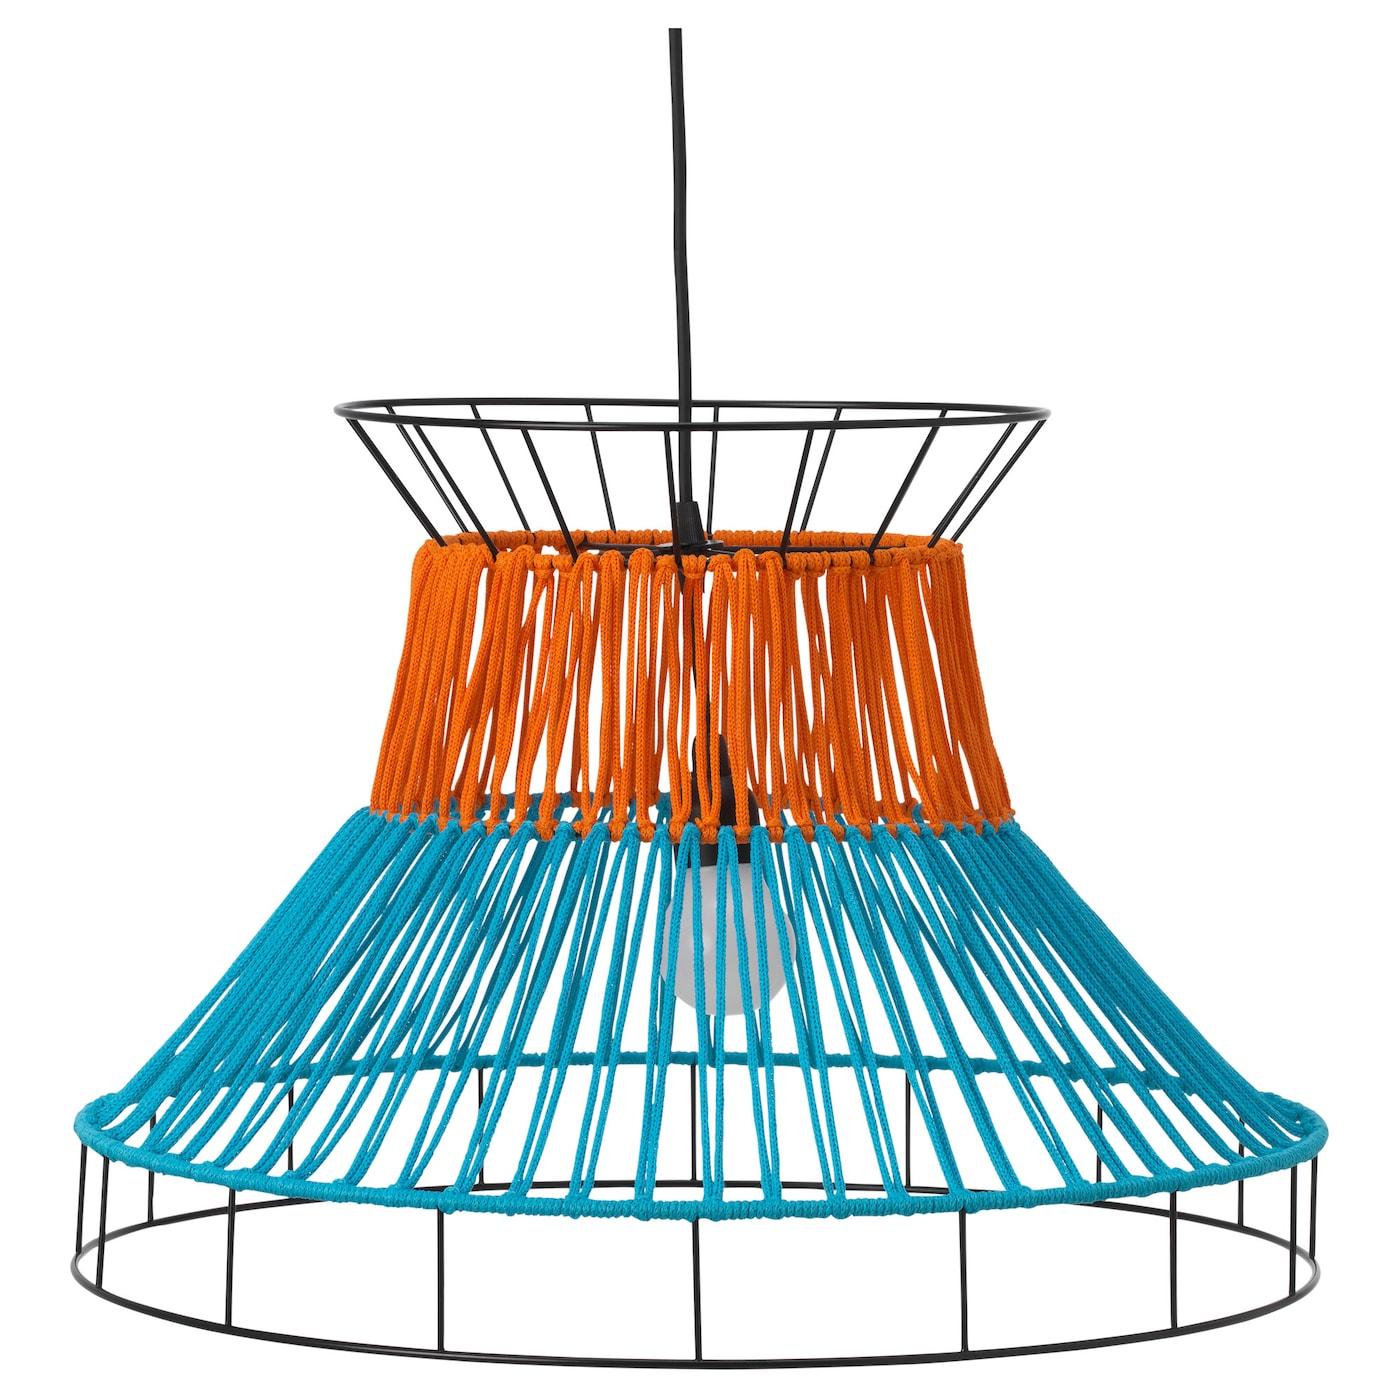 Solvinden led pendant lamp orangeblue outdoor 55 cm ikea ikea solvinden led pendant lamp aloadofball Image collections